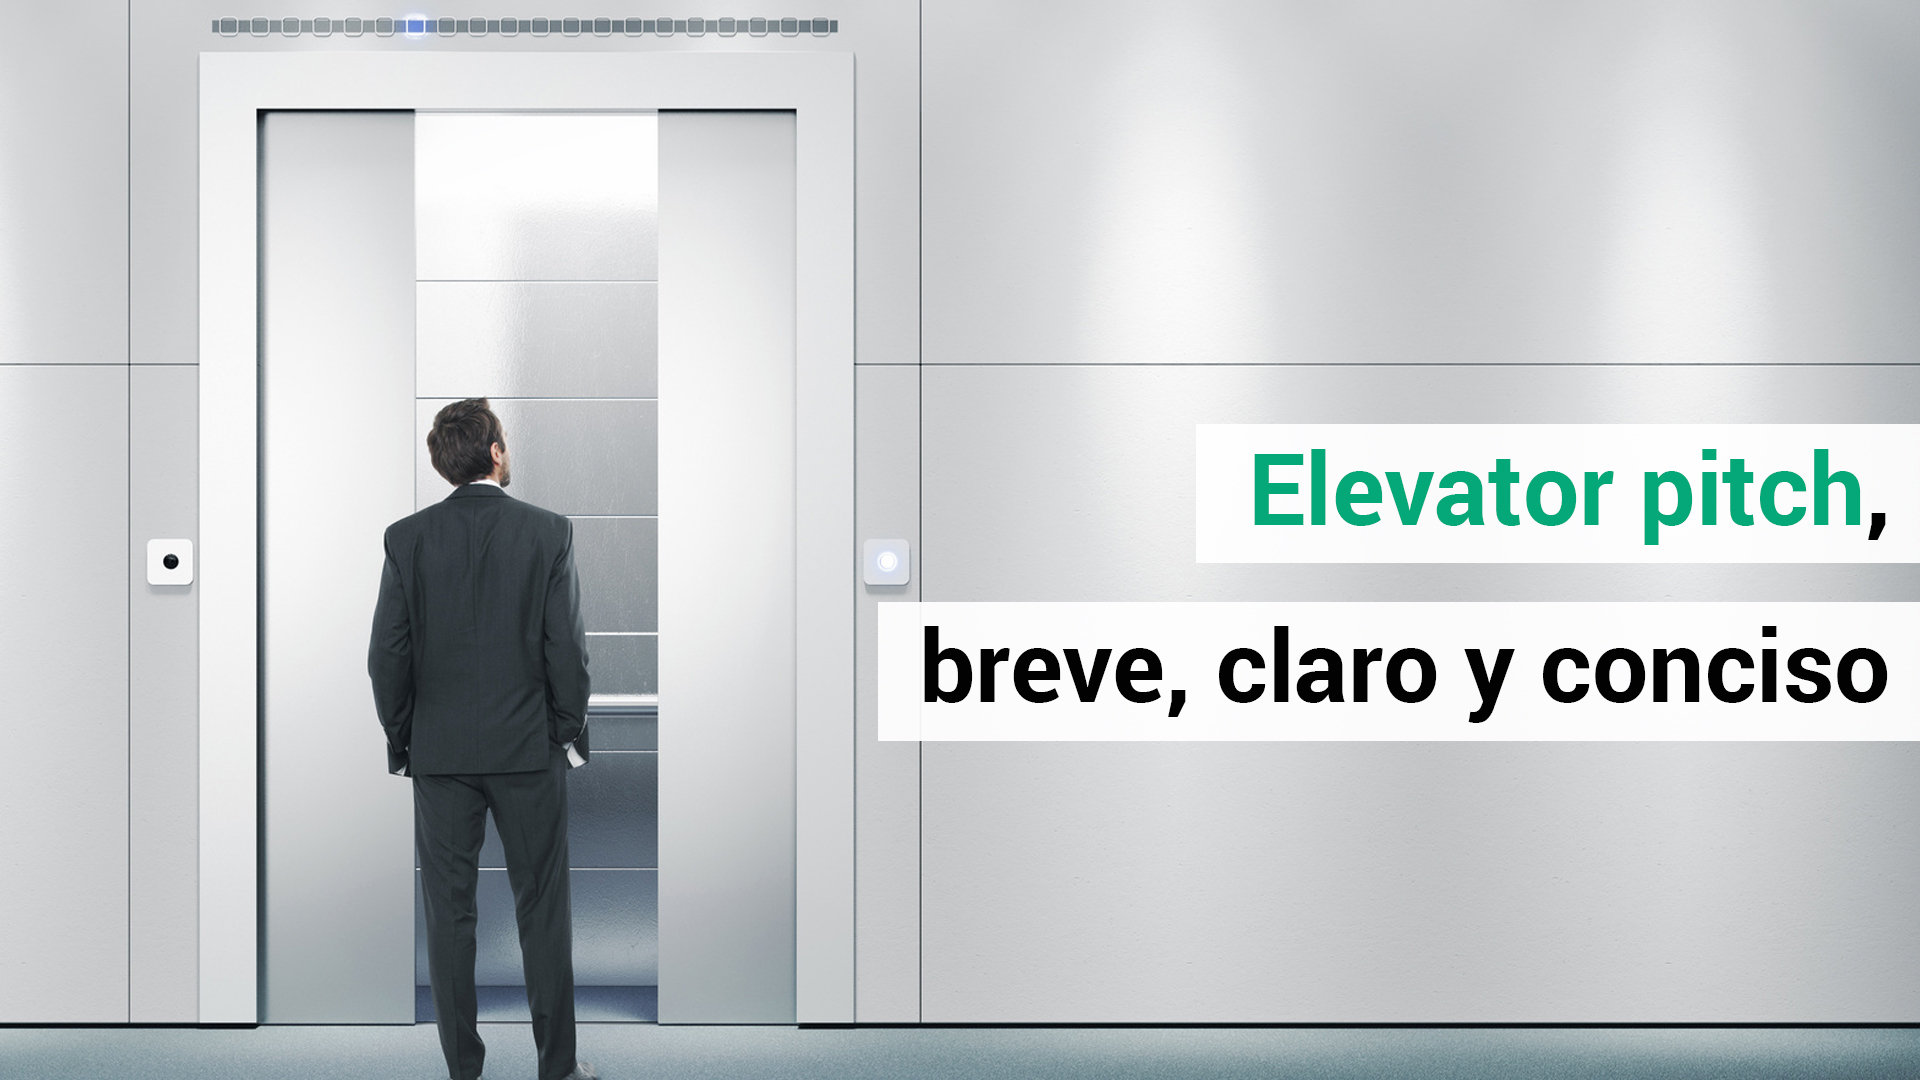 Ensaya tu 'elevator pitch'